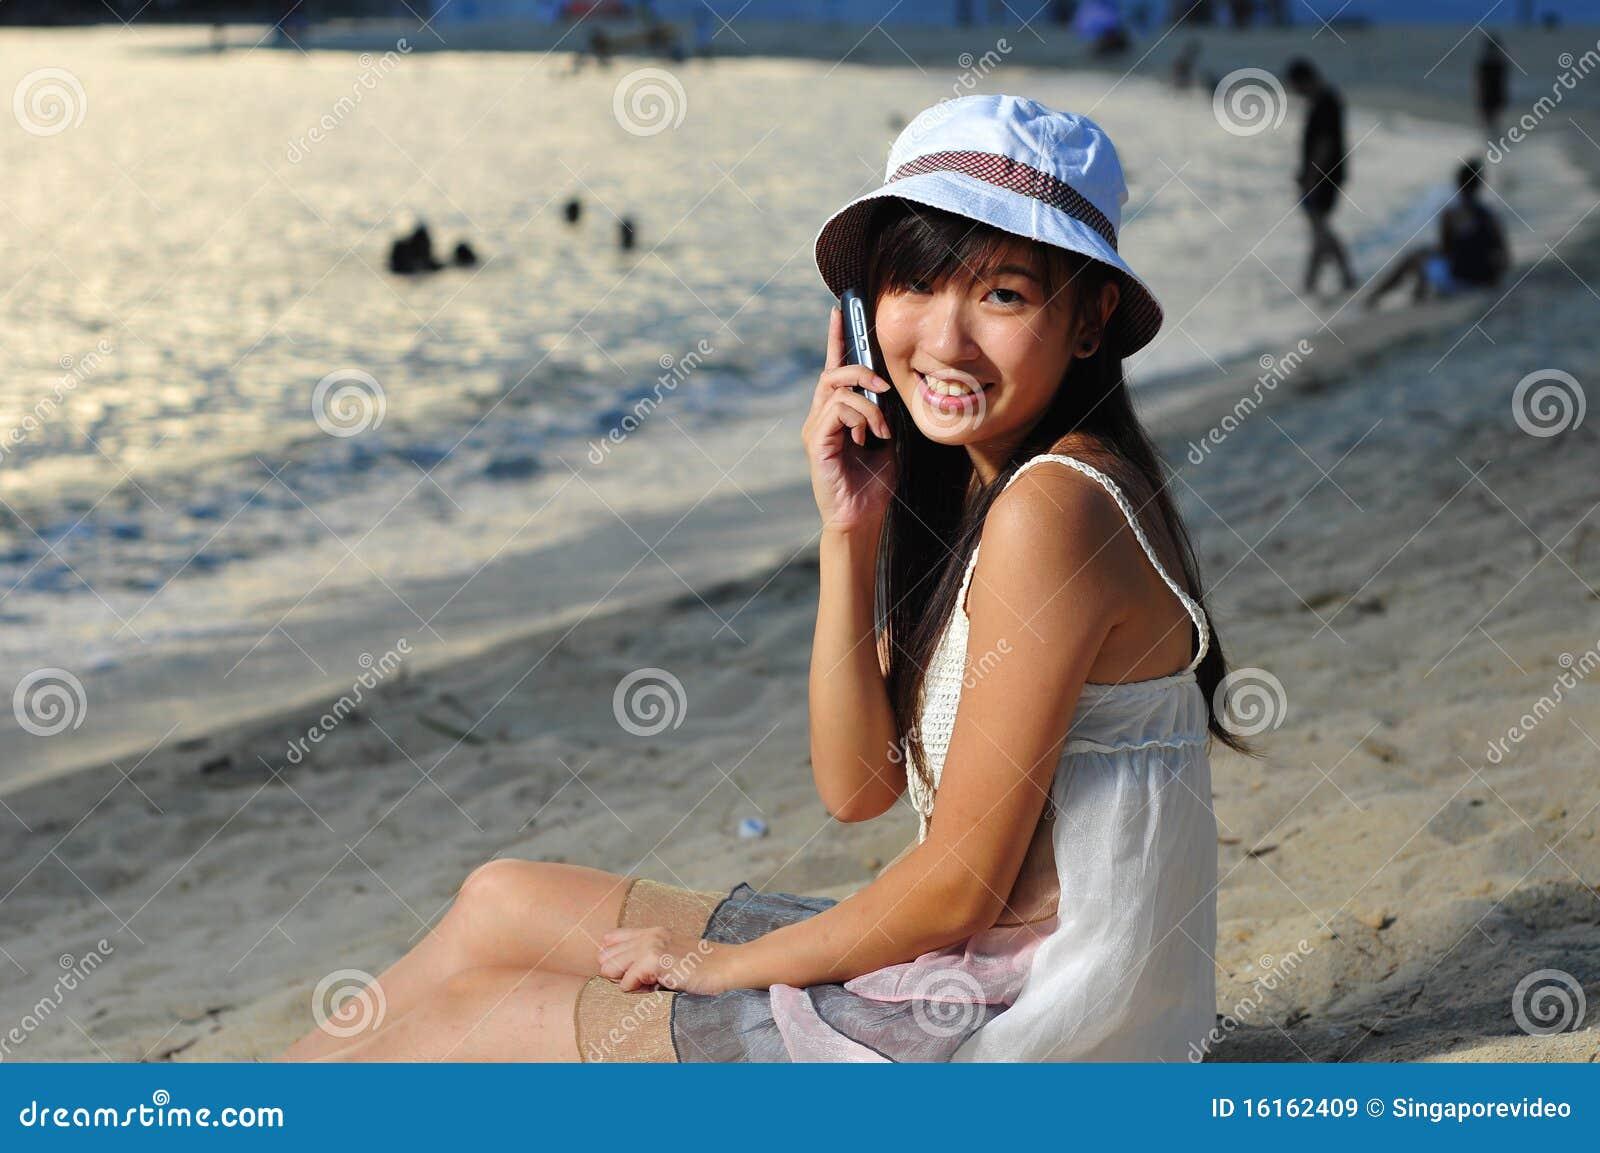 Chinese girl on beach seems brilliant